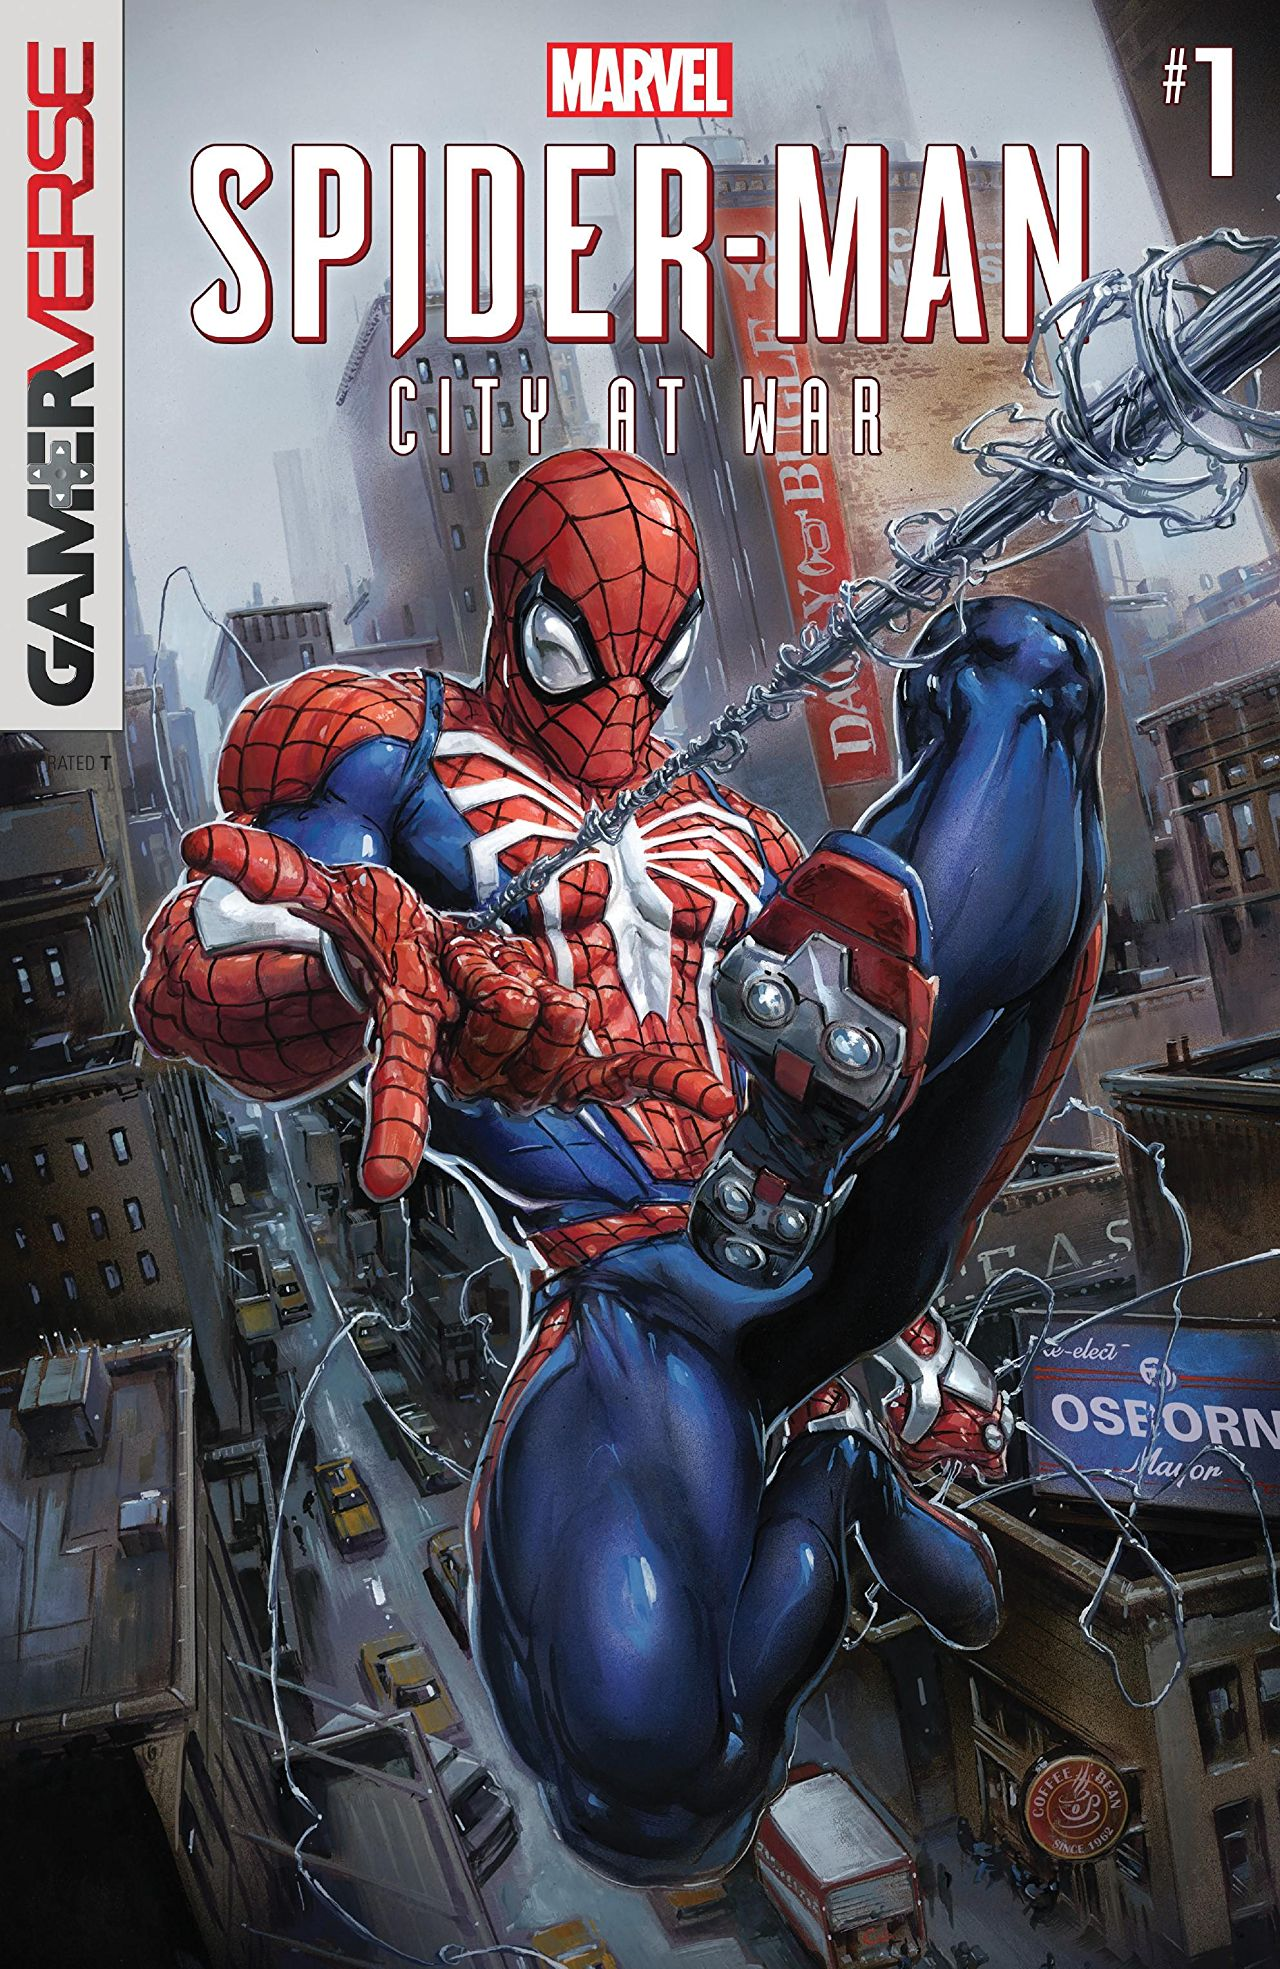 spidercitywar.jpg